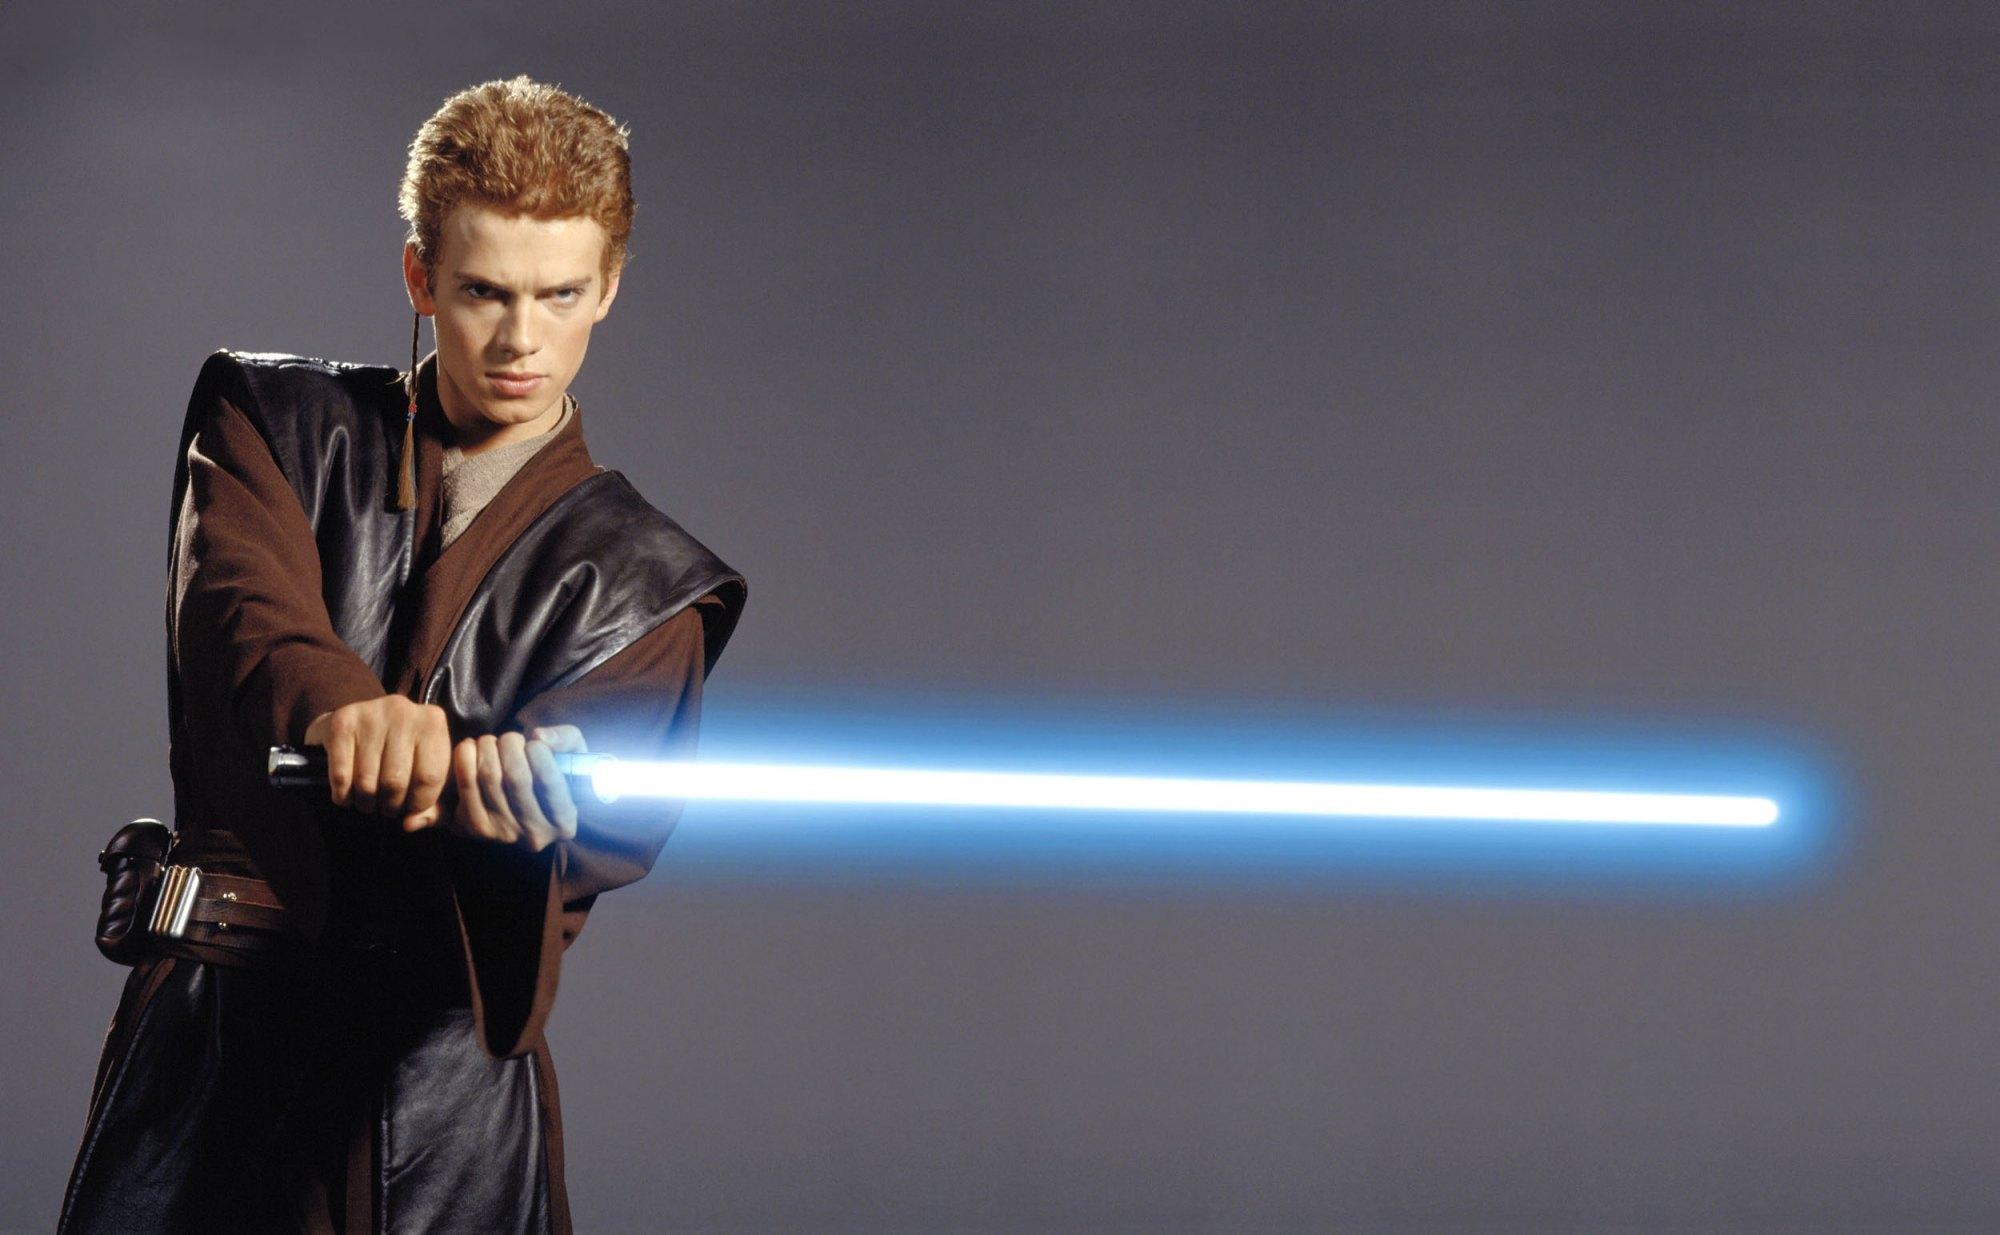 Attack of the Clones, Anakin Skywalker - Anakin Skywalker ...